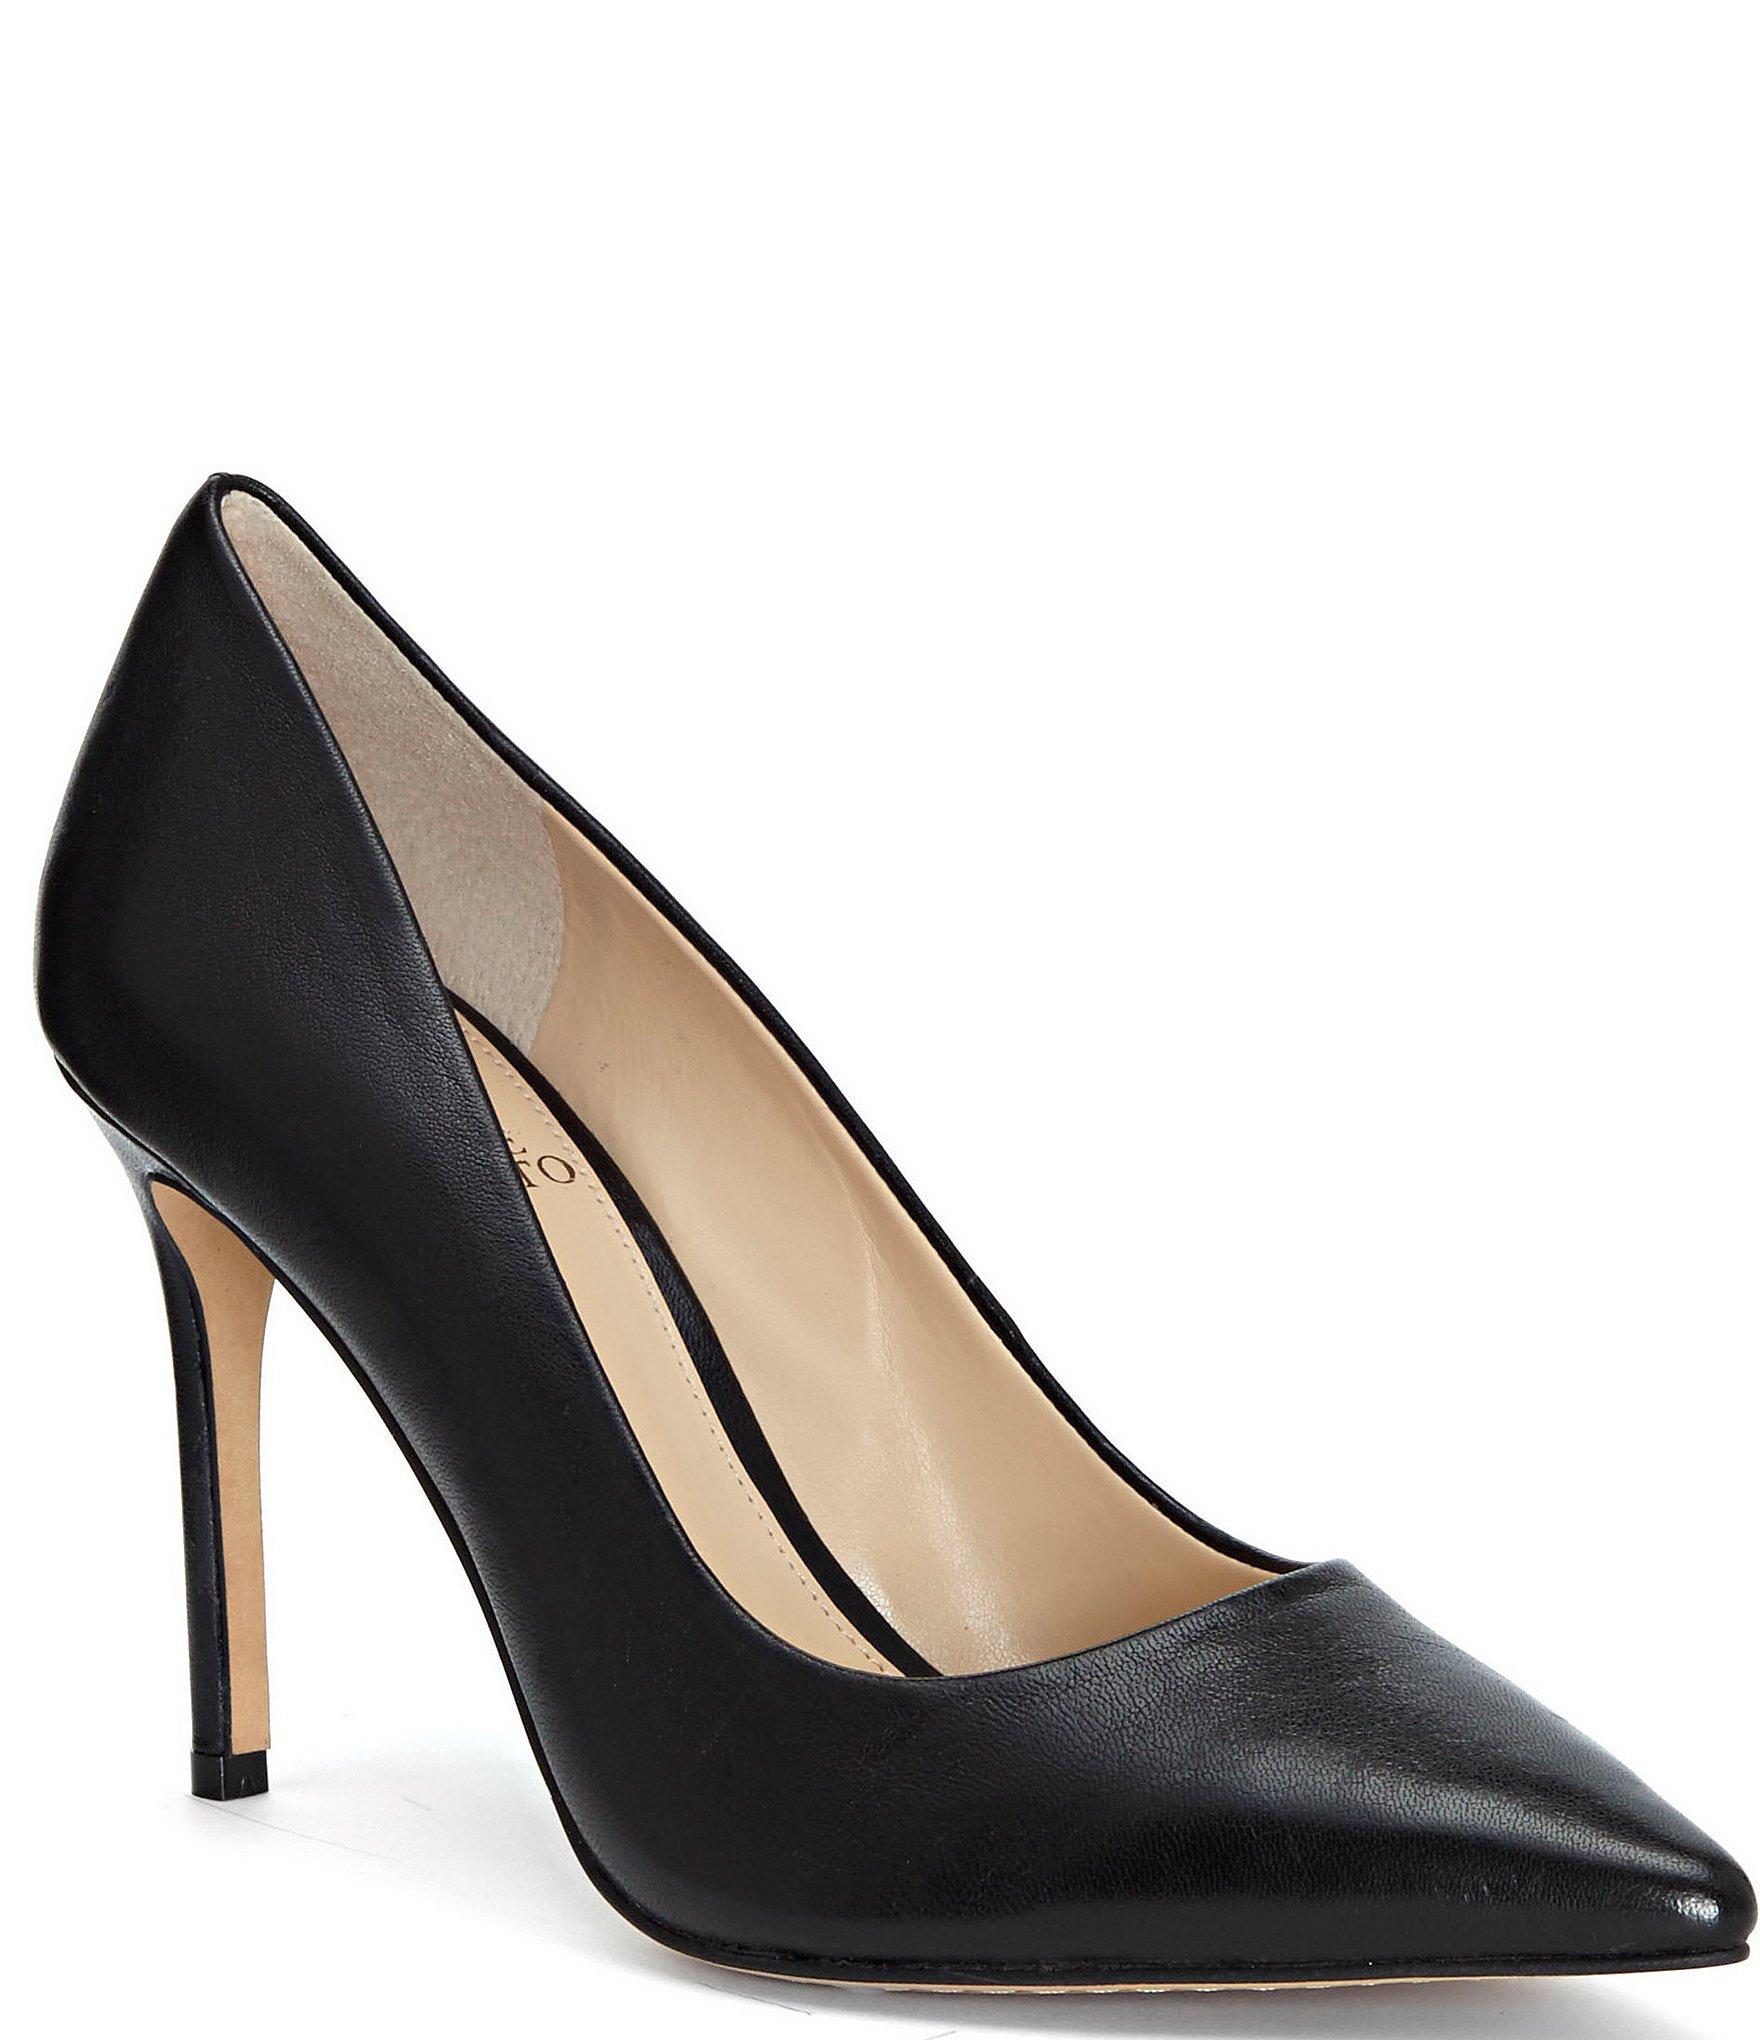 Pumps & High Heels for Women On Sale, Black, Leather, 2017, 3.5 4.5 Michael Kors